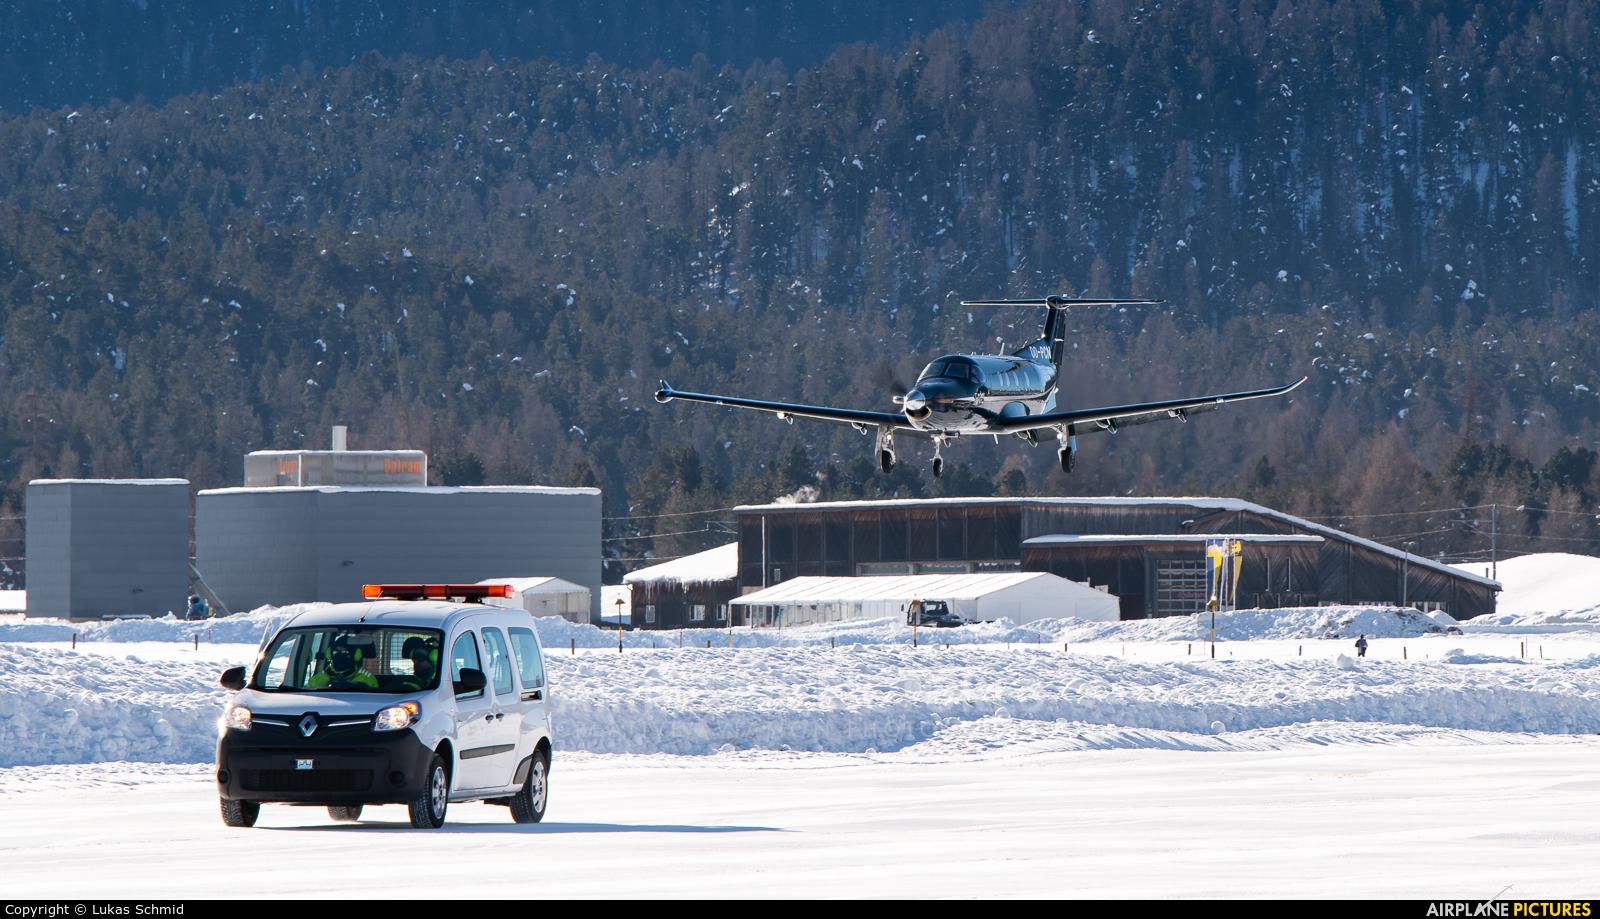 European Aircraft Private Club OO-PCN aircraft at Samedan - Engadin